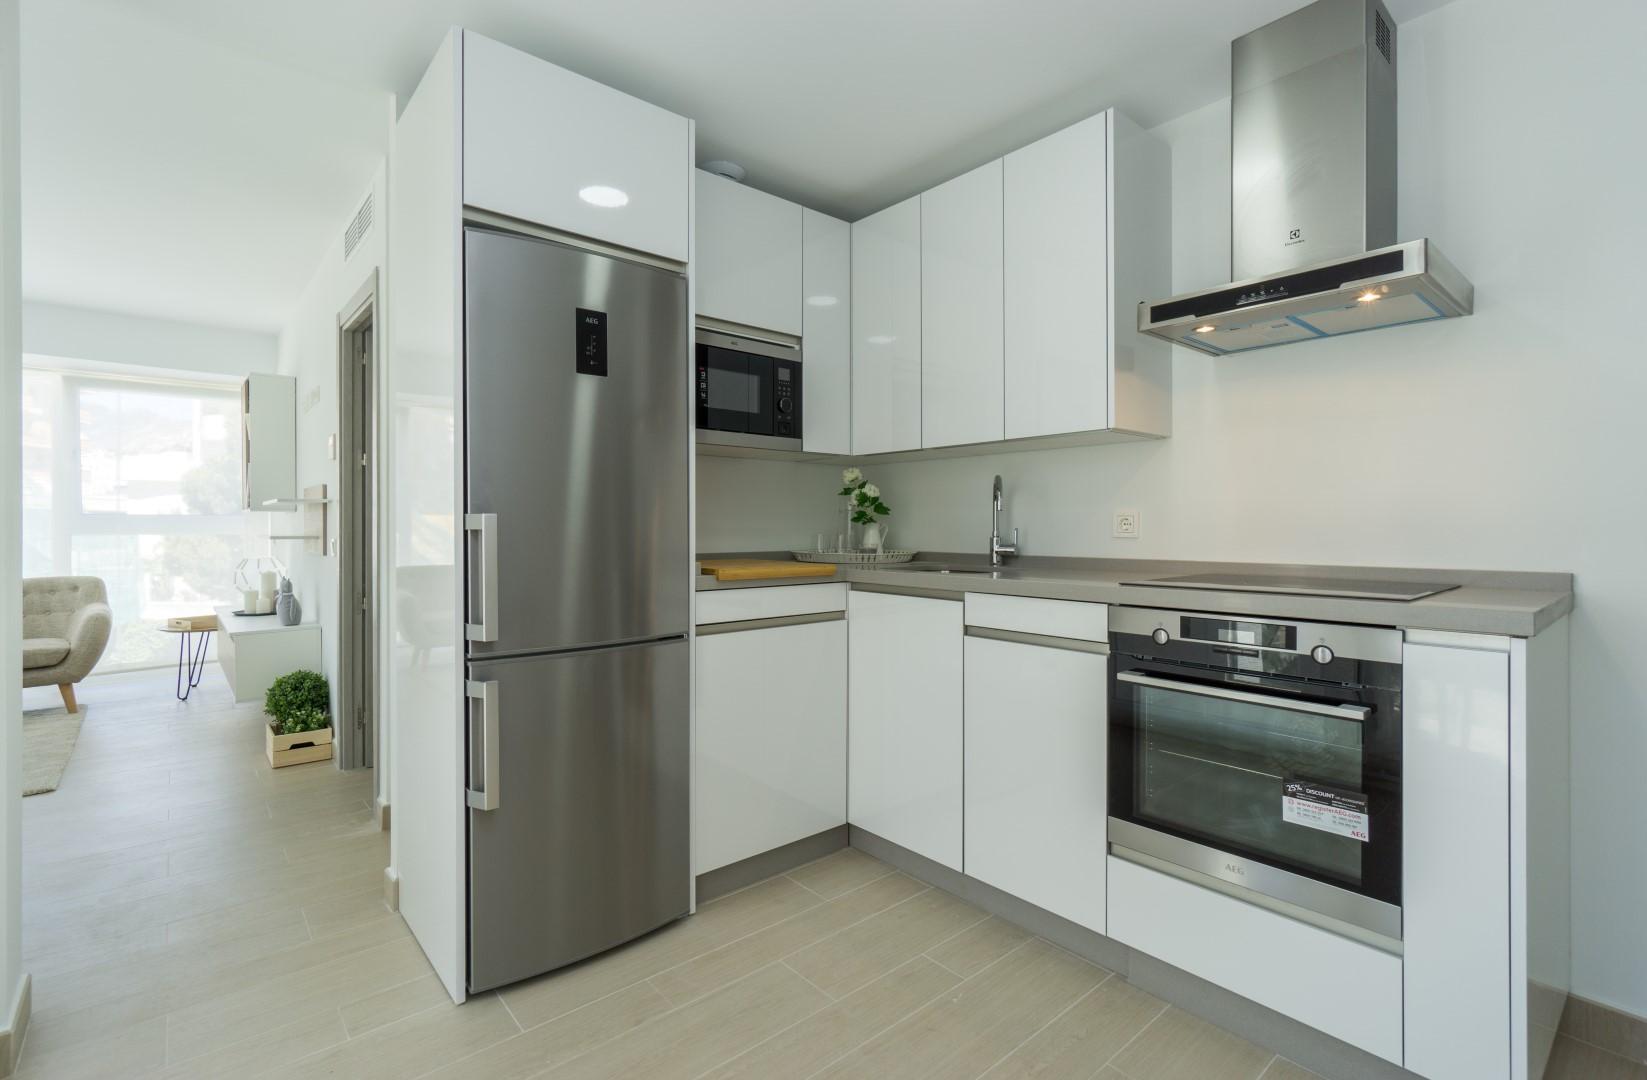 Apartment in Benalmadena MA3142741 6